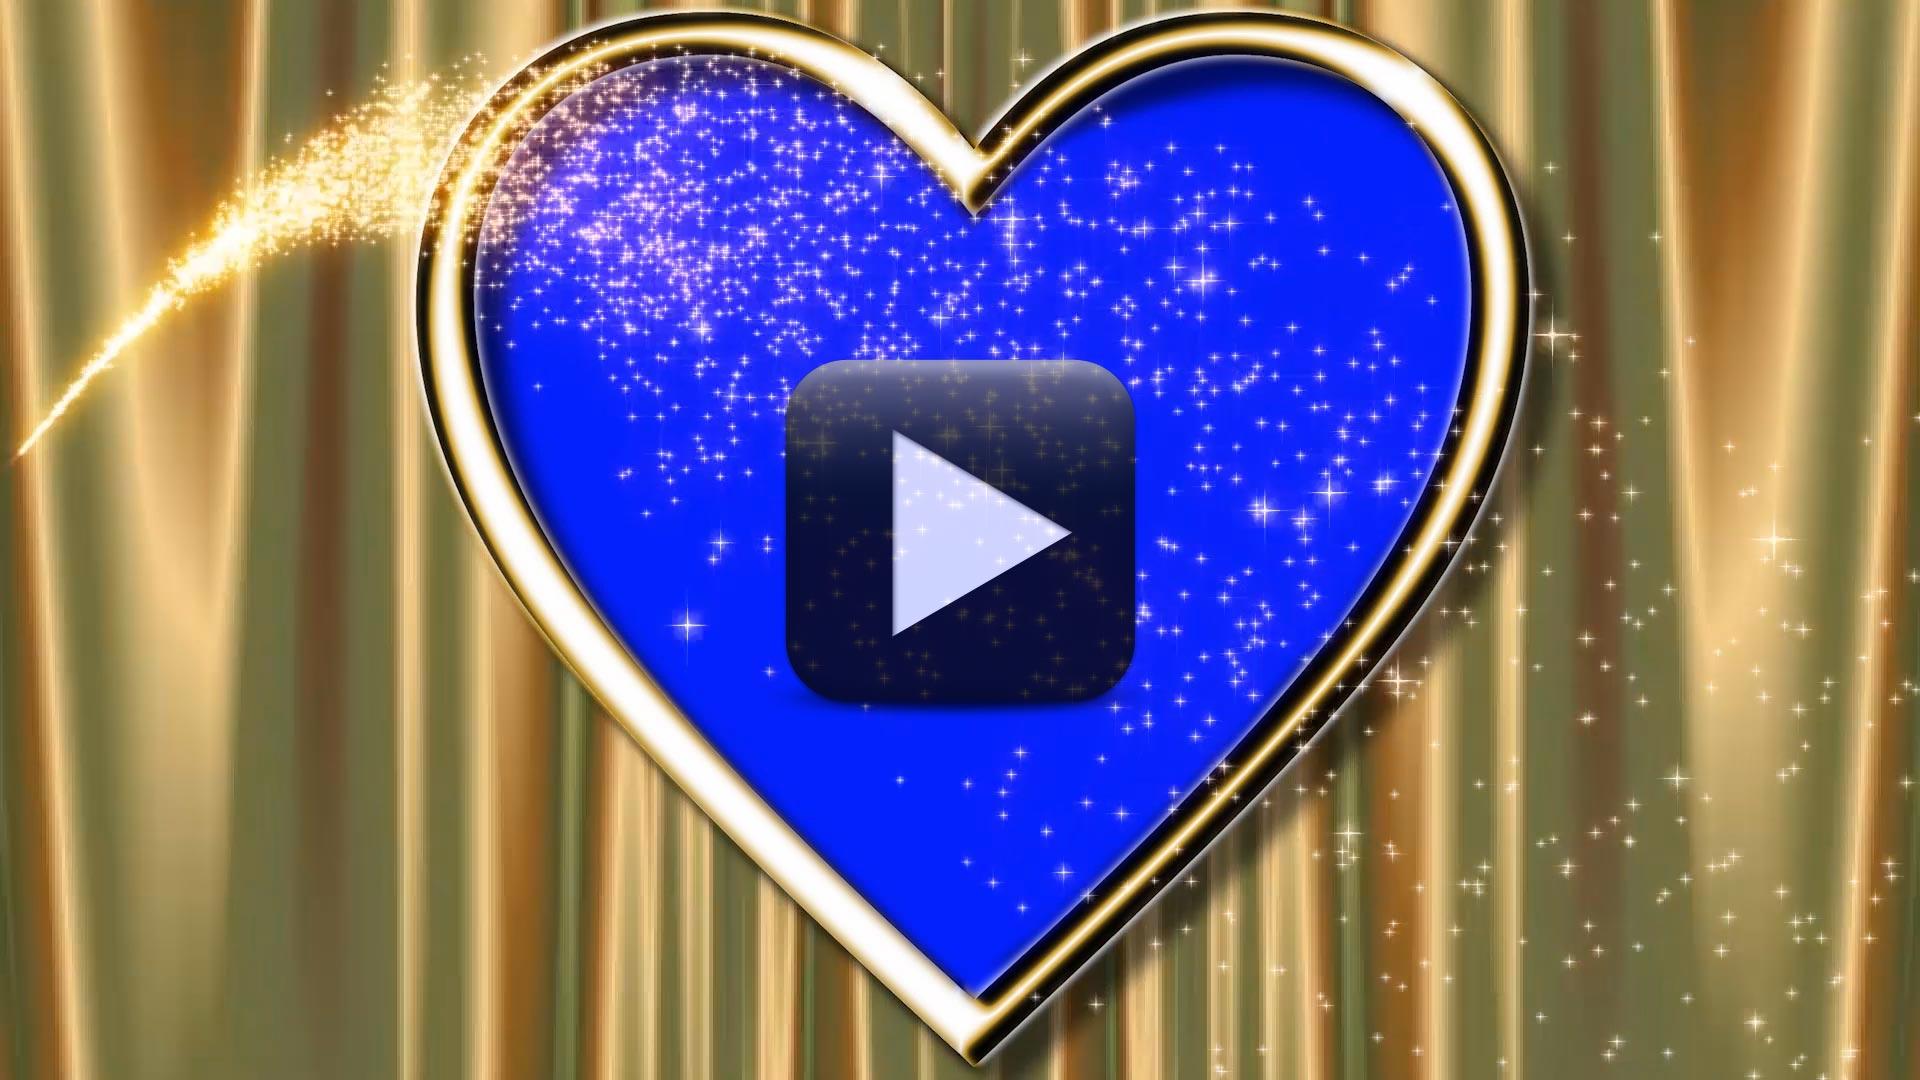 Wedding Video Background HD